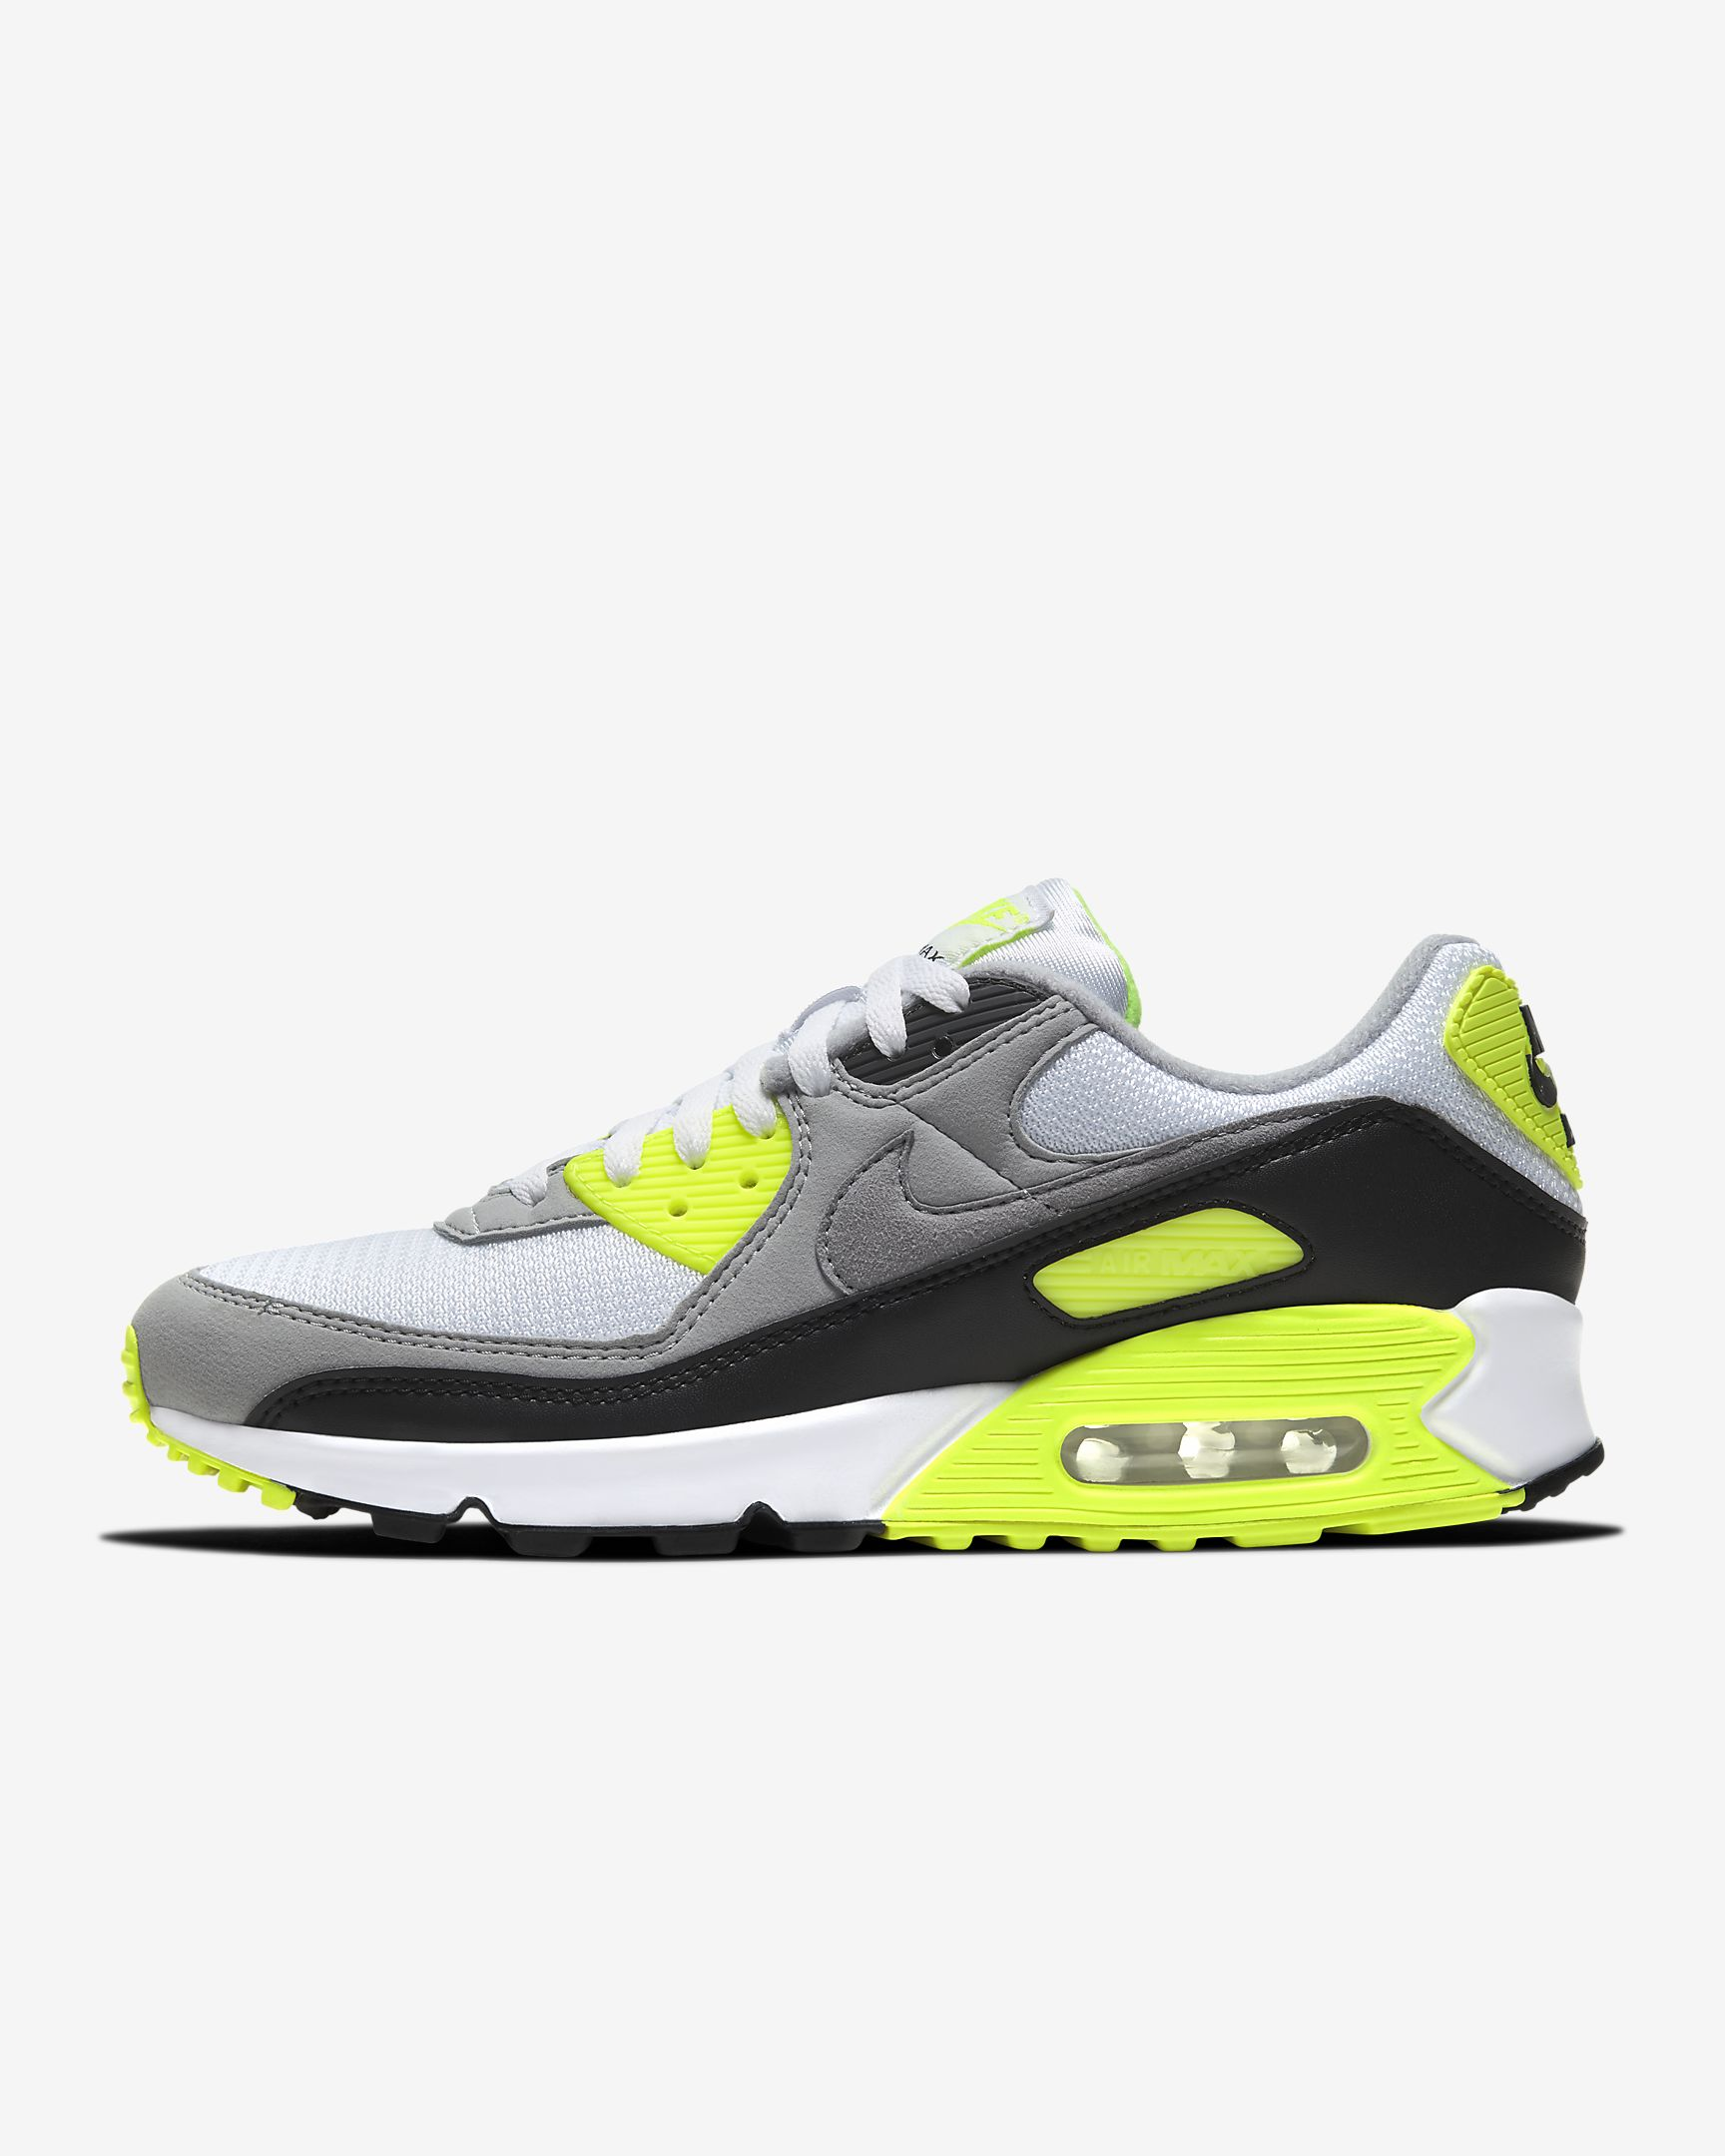 Herenschoen -Nike Air Max 90